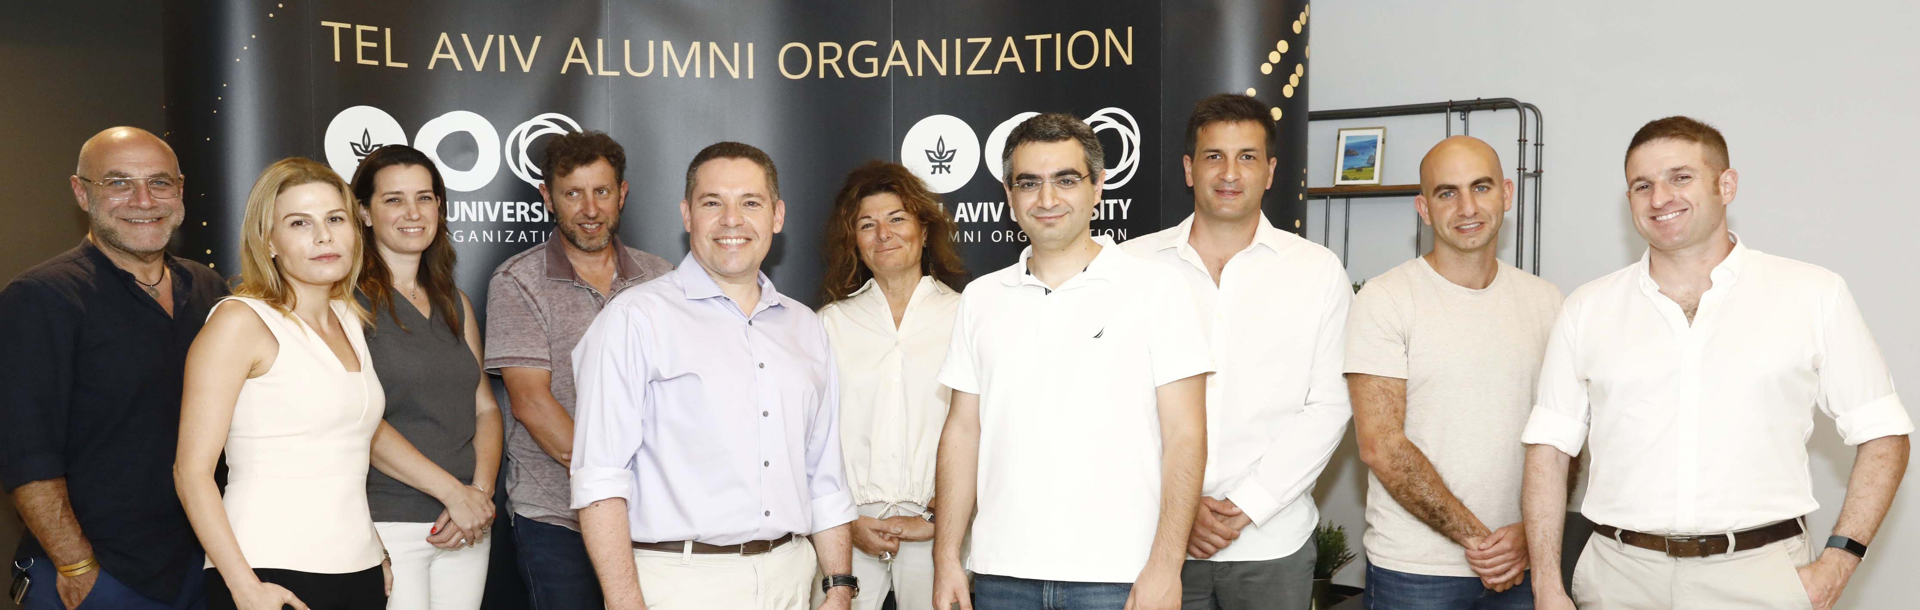 What is the connection between Dvir Bendek, Udi Danino and Karen Schwok? They were all chosen to serve as members of the new Tel Aviv University Alumni Organization Advisory Committee.